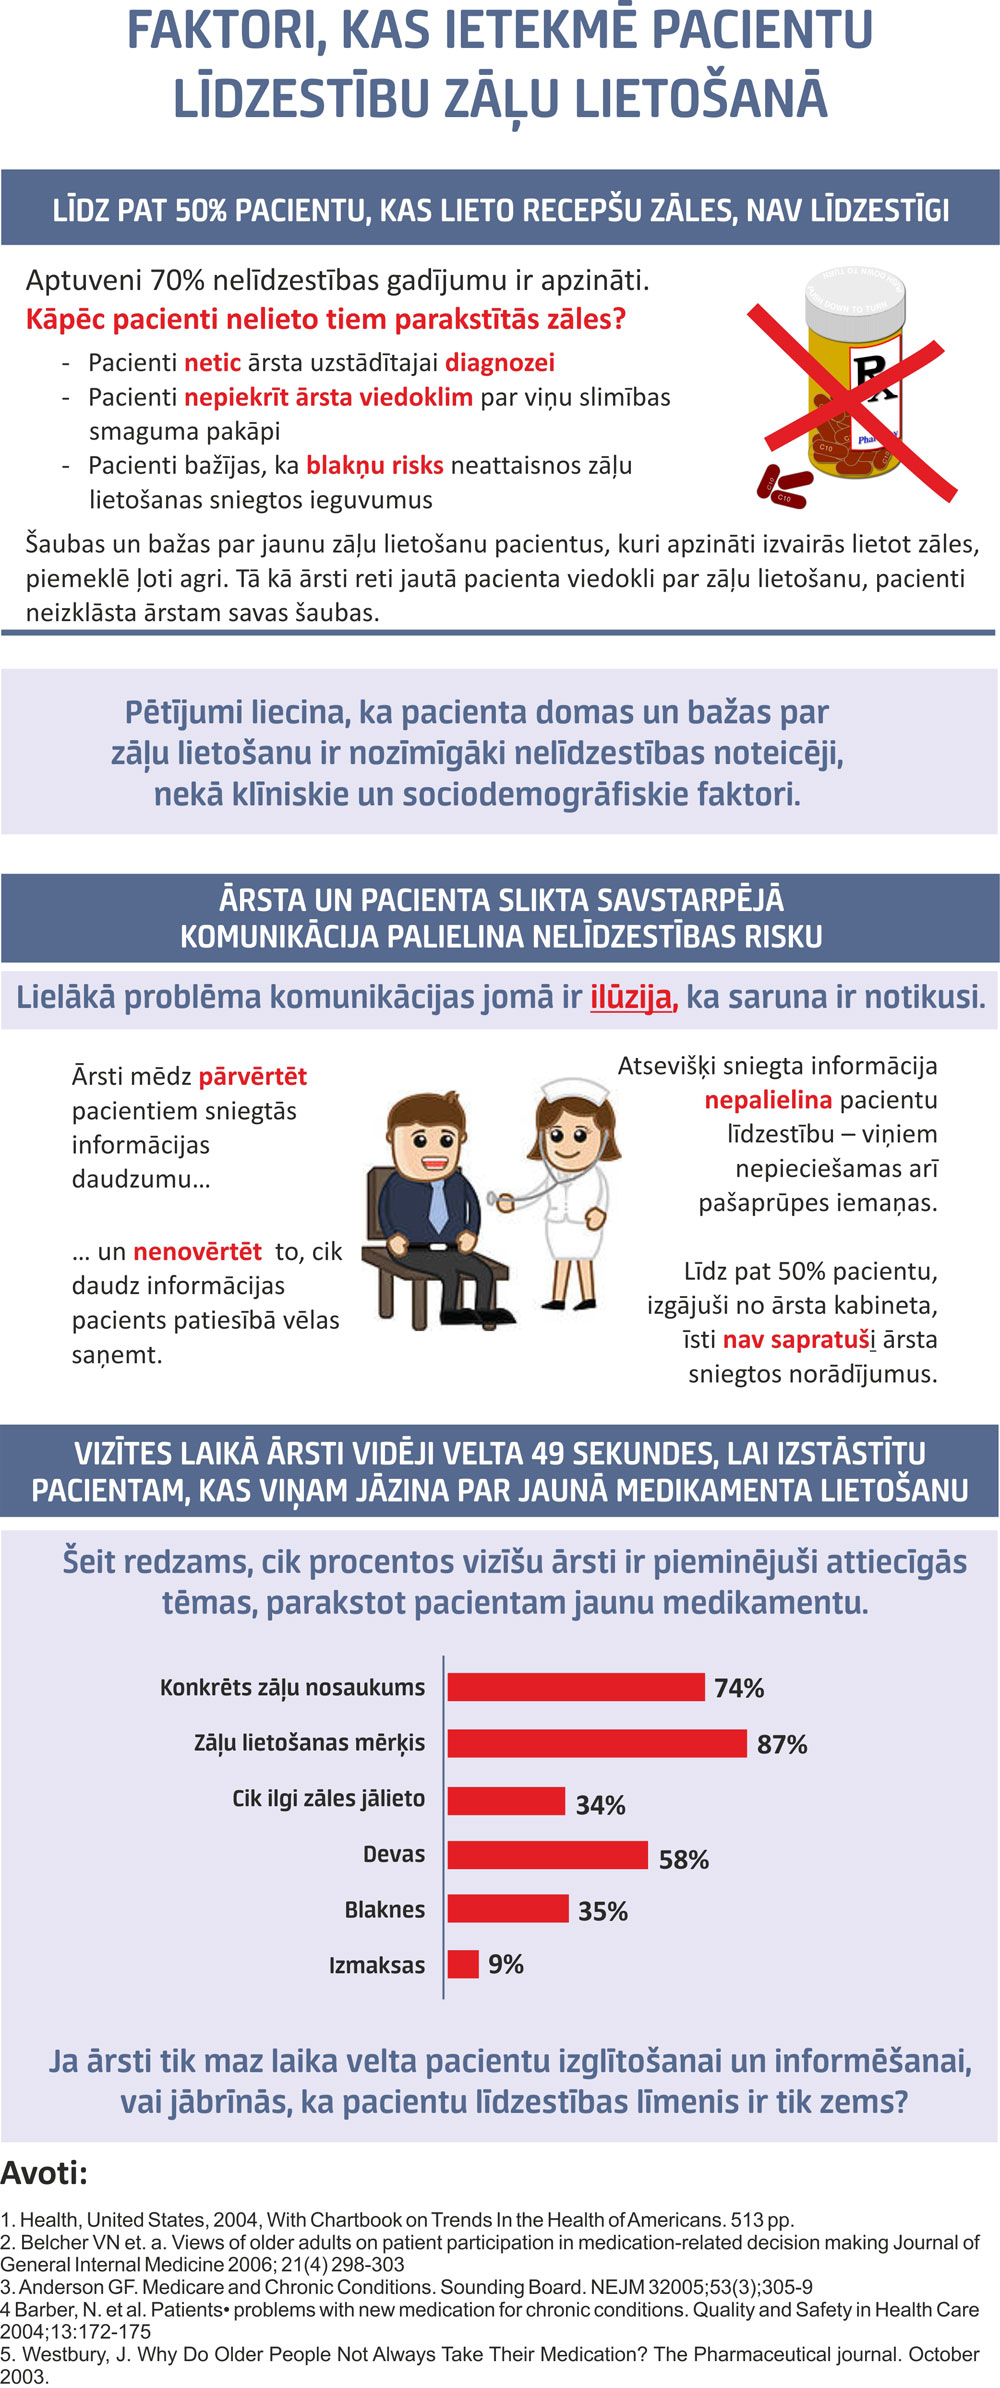 infogr_lidz